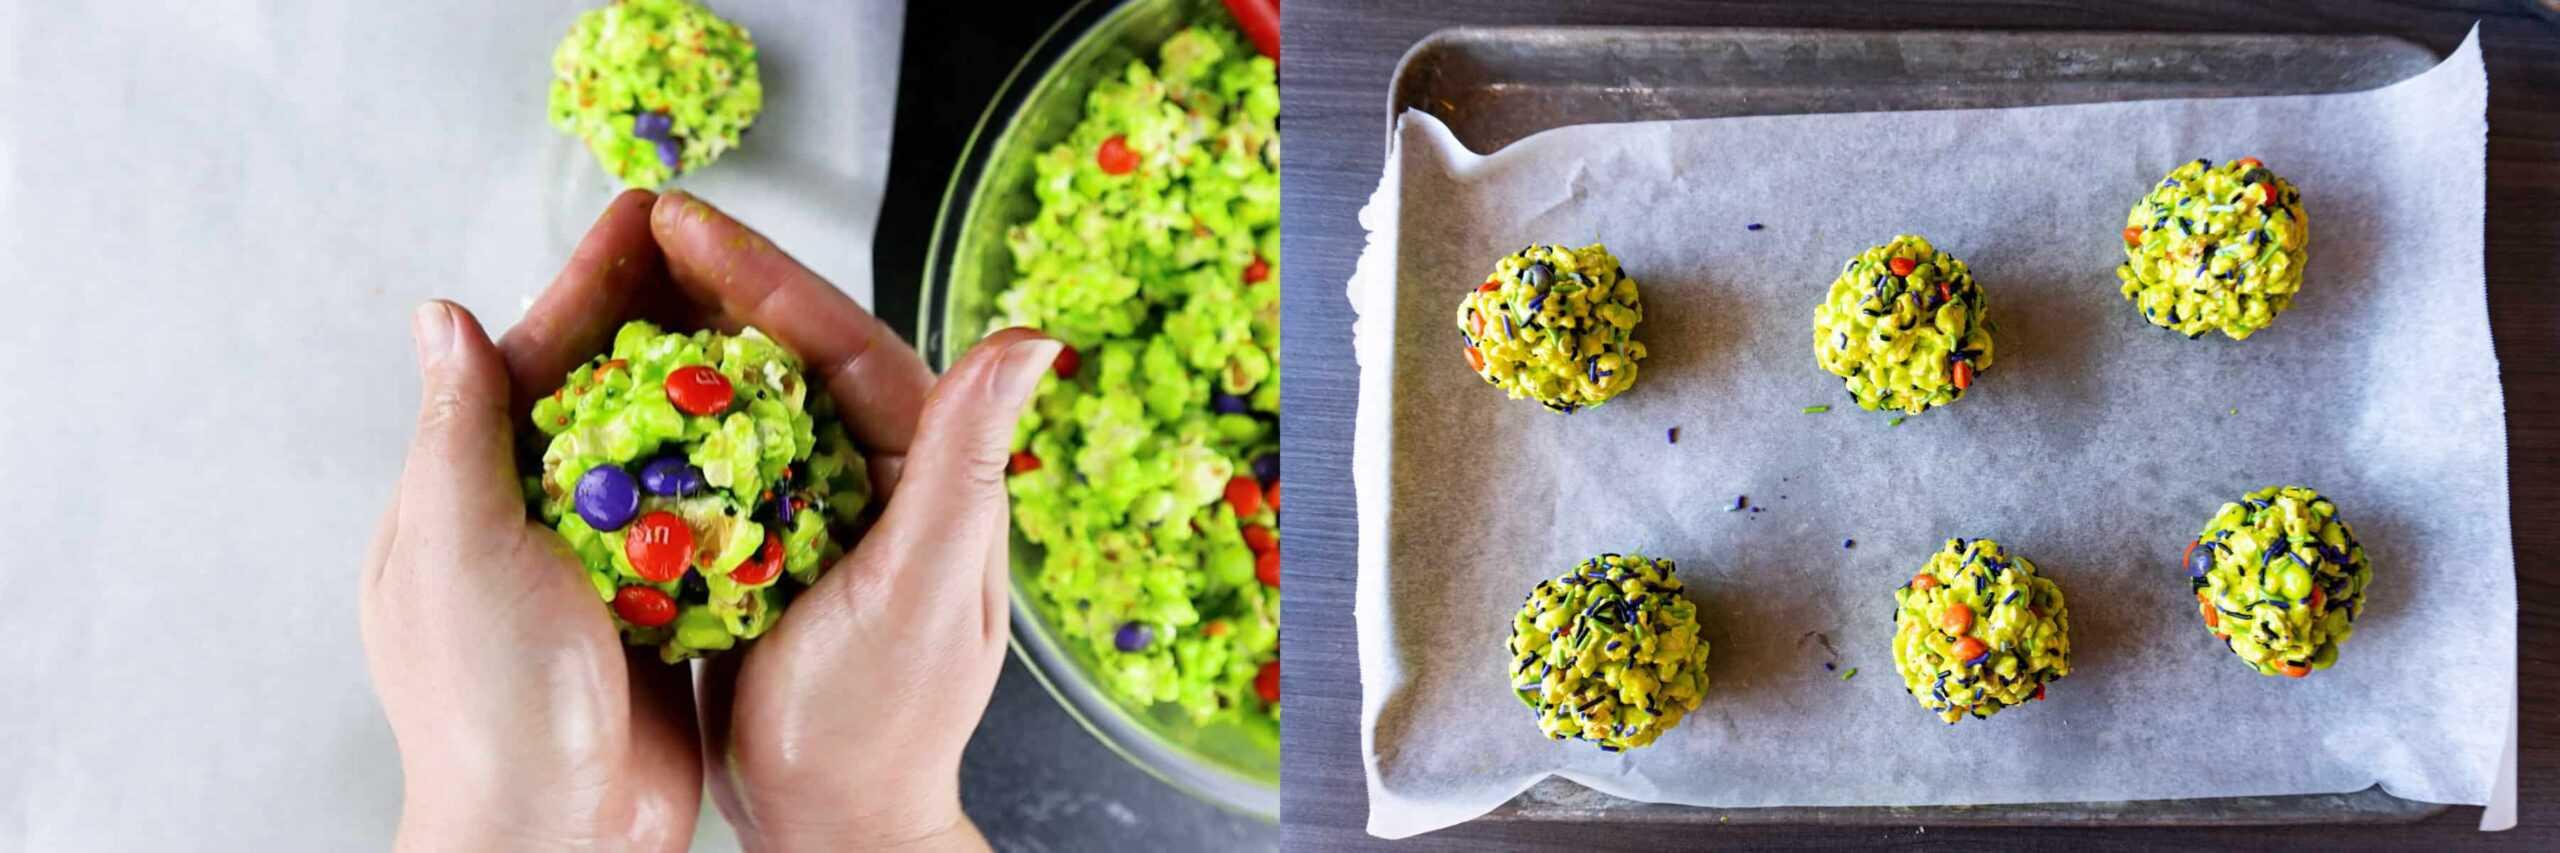 shaping the popcorn balls